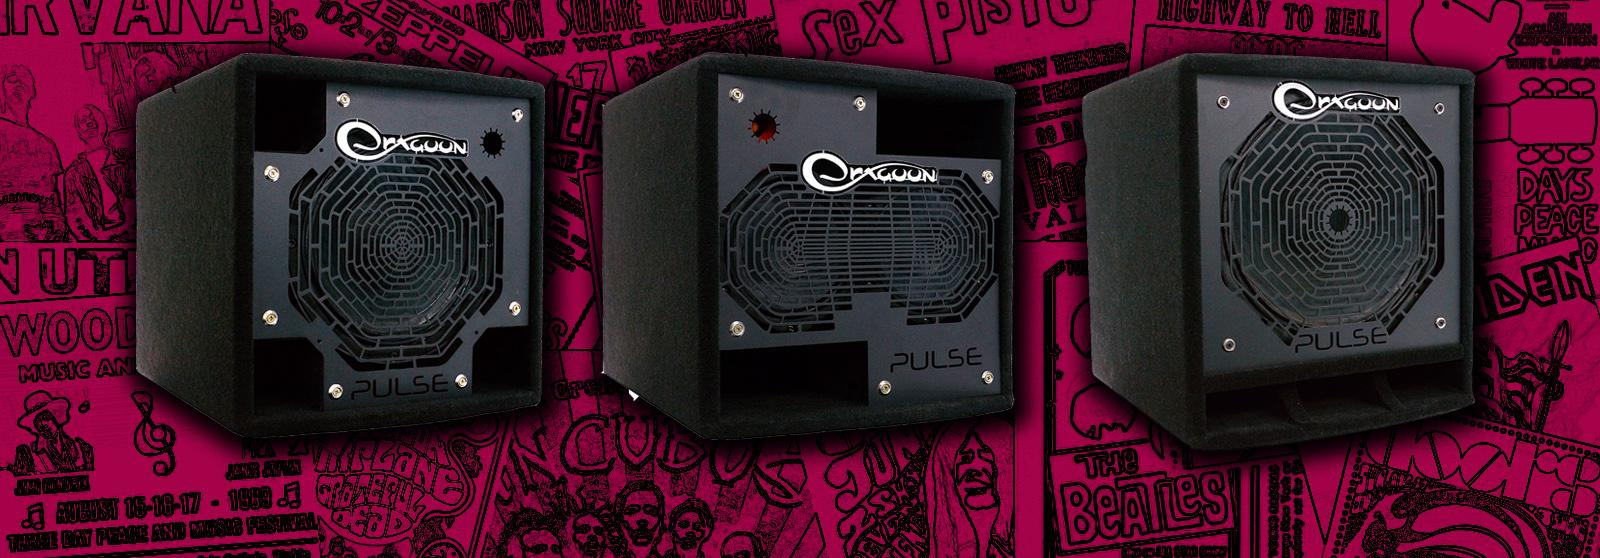 Dragoon - The Custom Speaker - DRAGOON-PULSE®_20160329171820344278.jpg